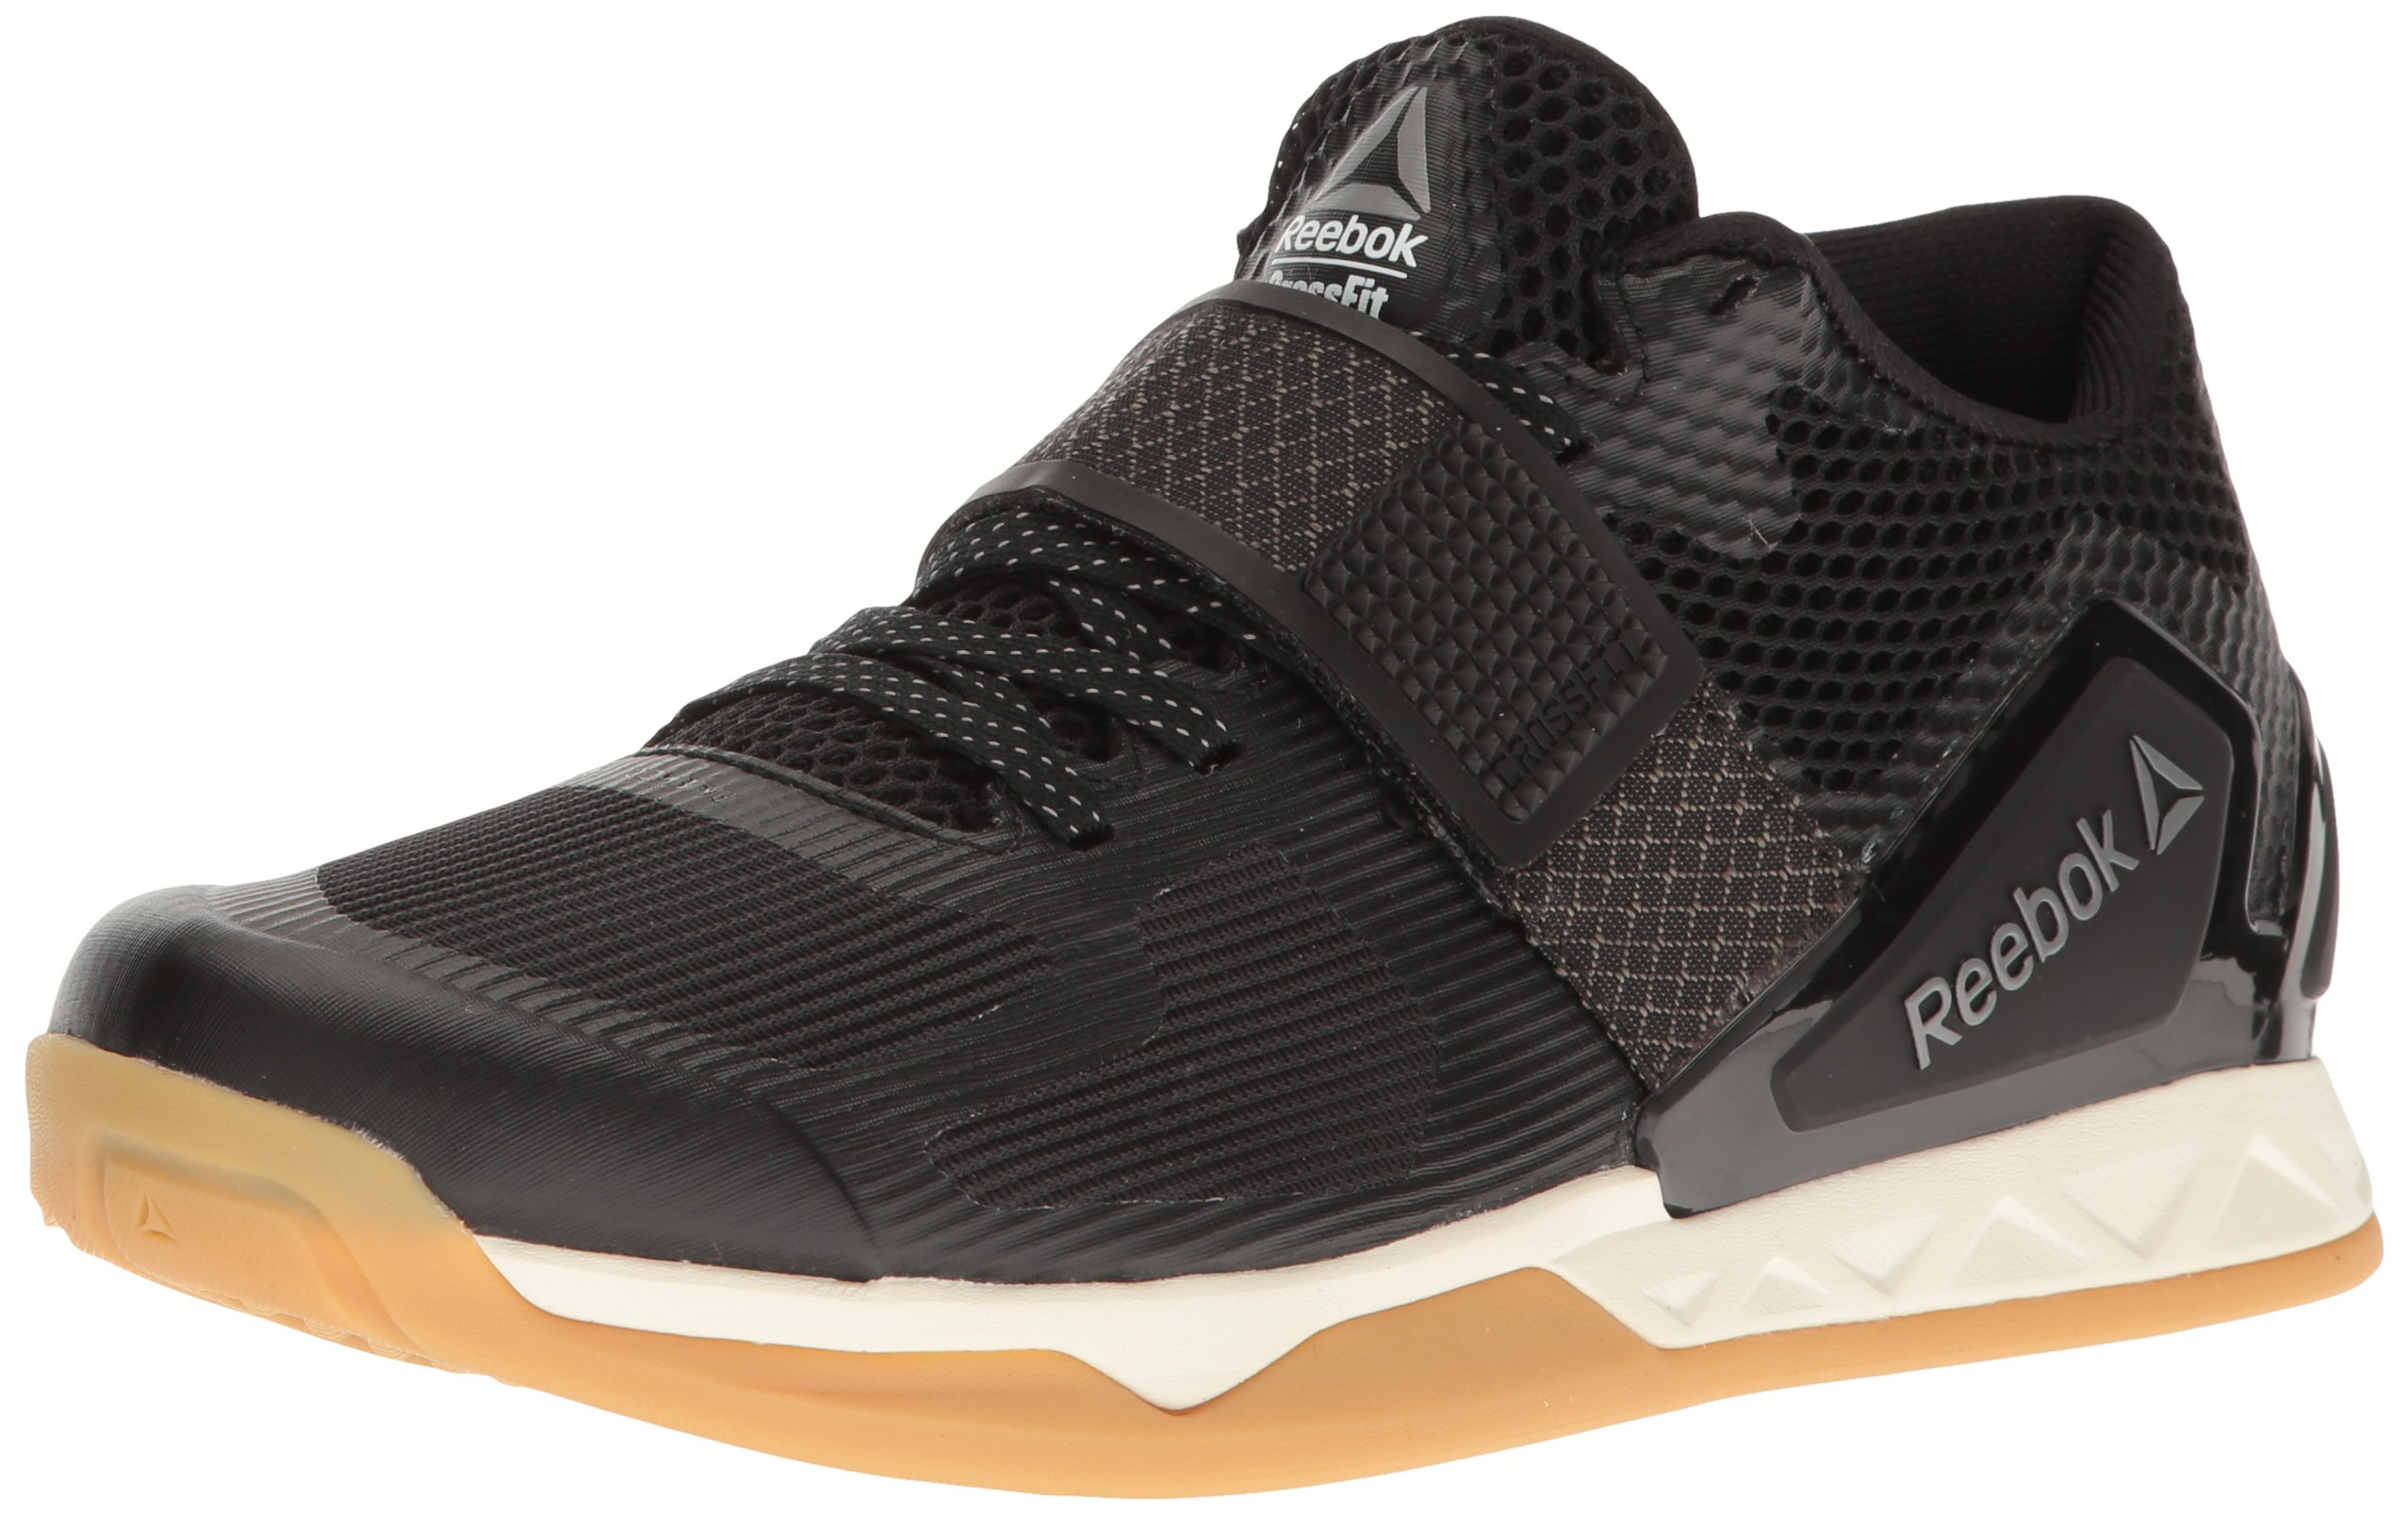 Reebok Women's Crossfit Transition Lft Cross-Trainer Shoe, Black/Classic White/Rbk Rubber Gum/Pewter, 9 M US